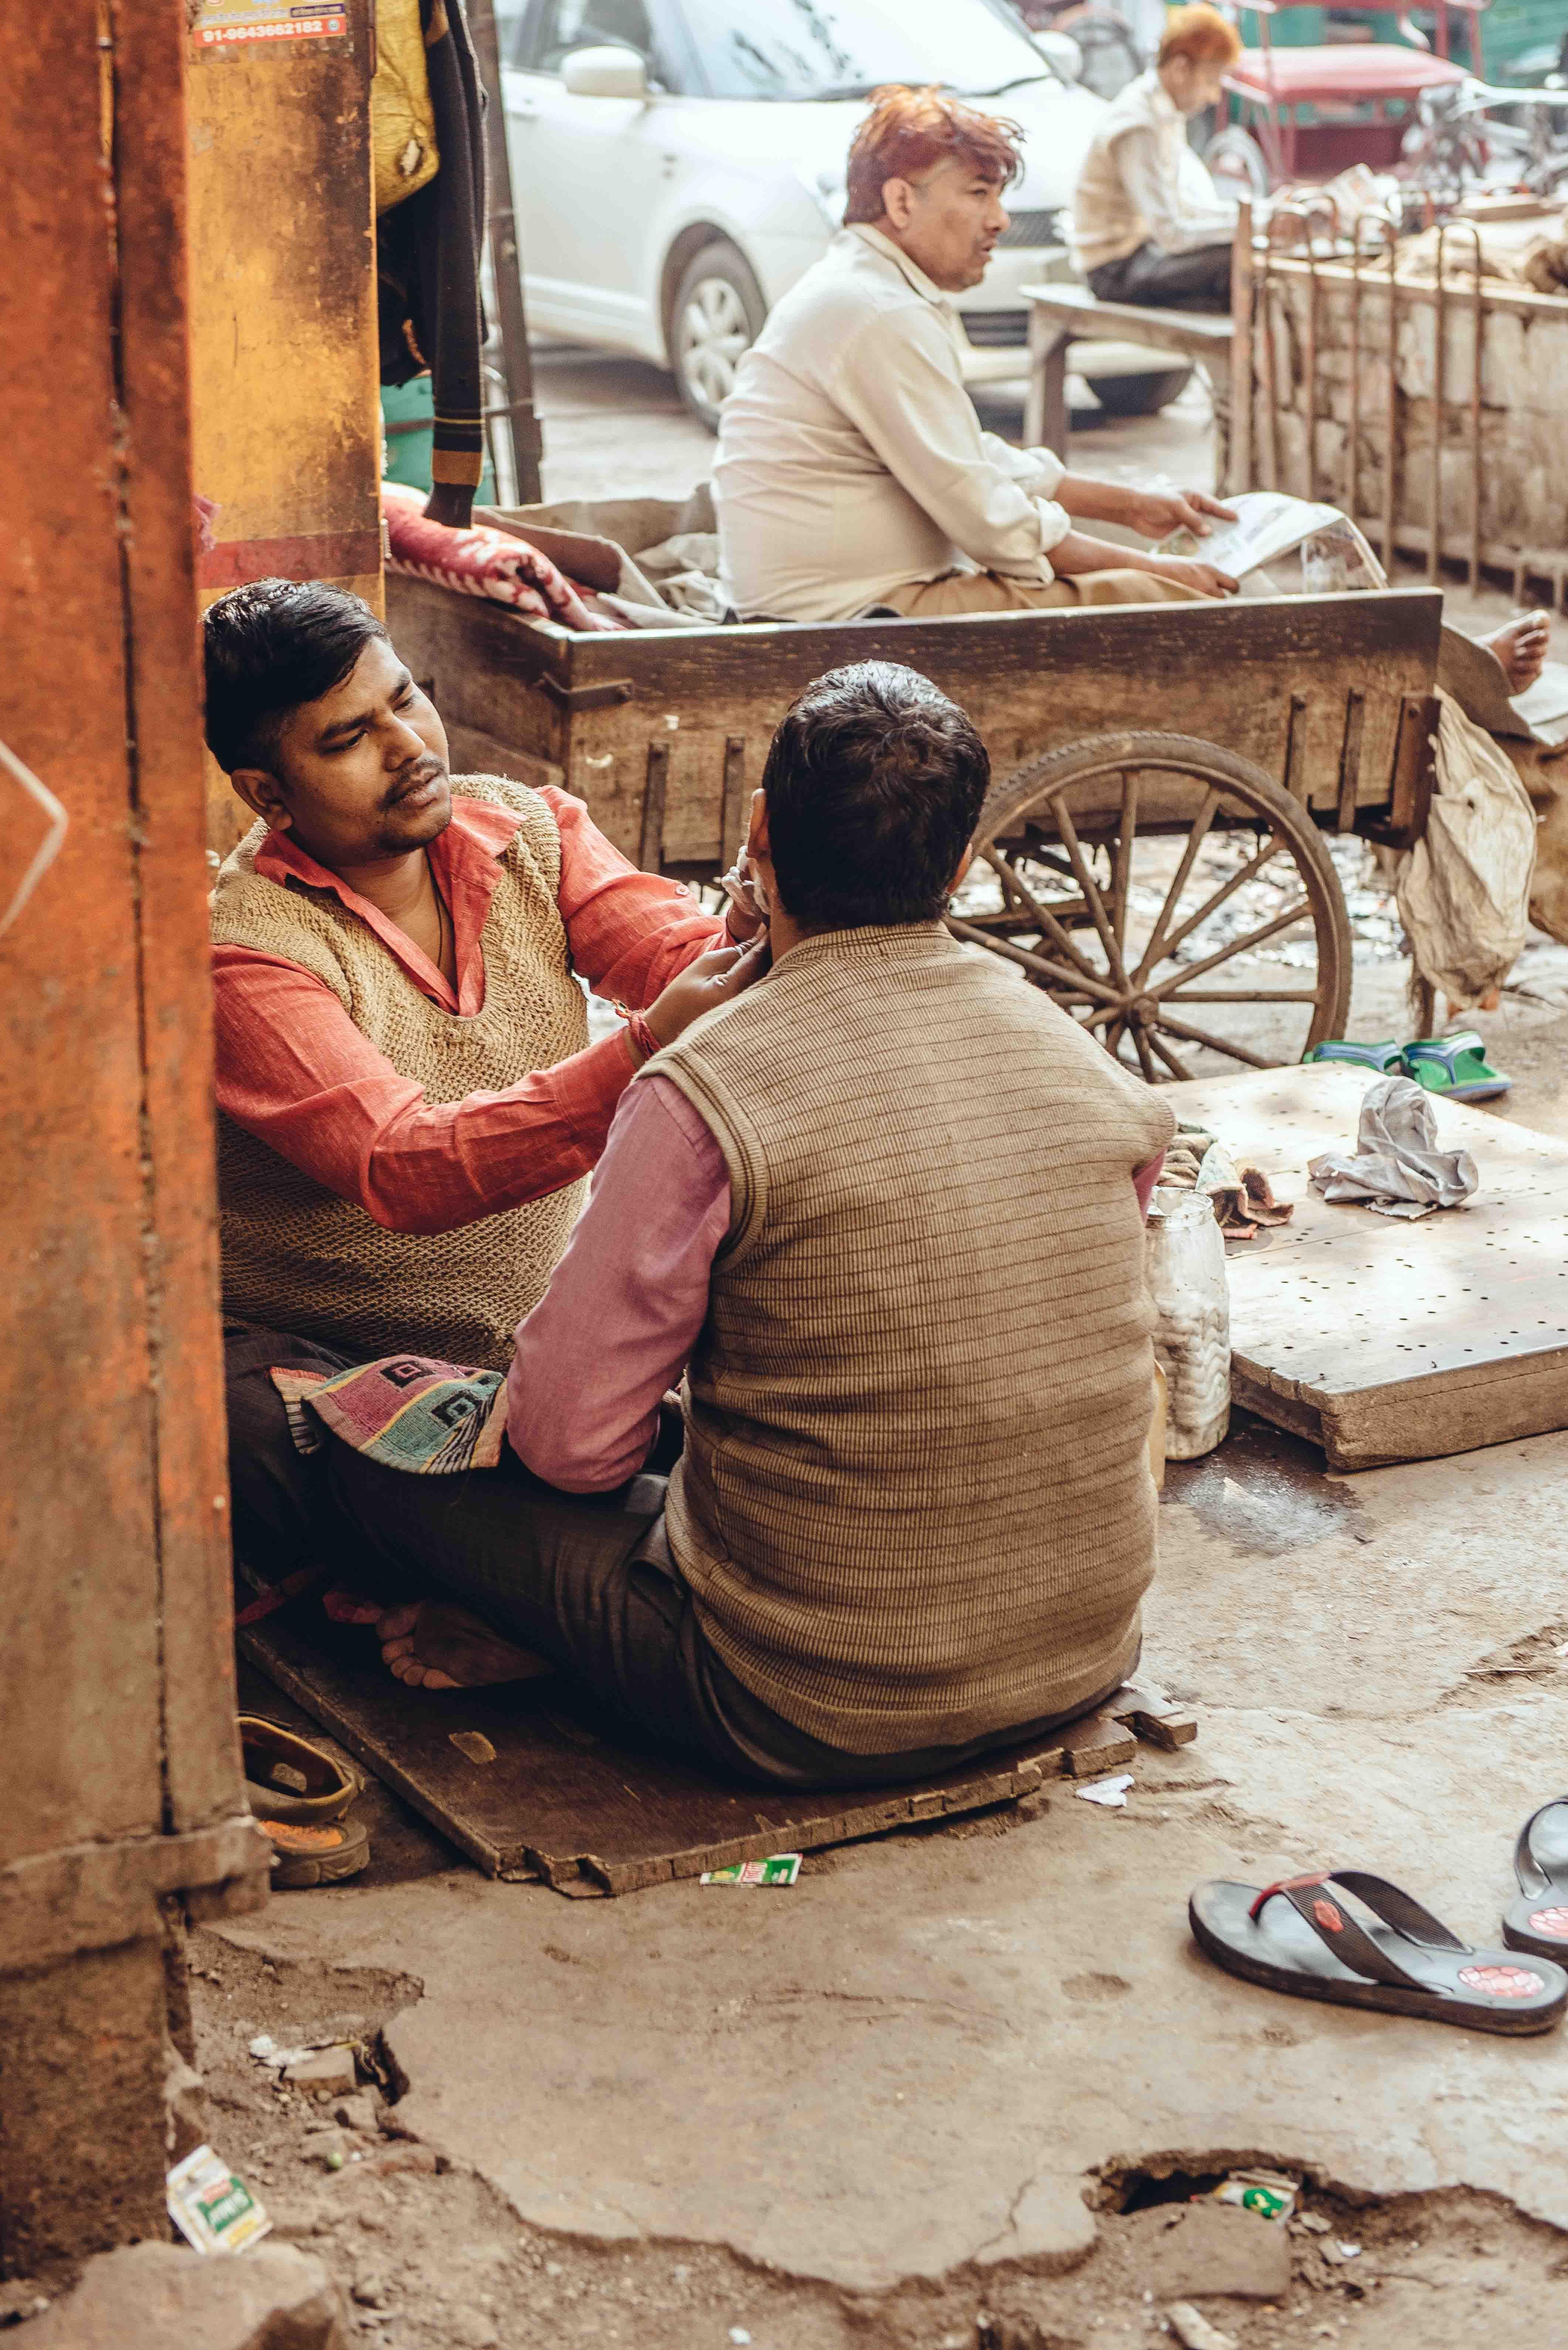 DELHI STREETS – INDIA www.chasintherisingsun.com